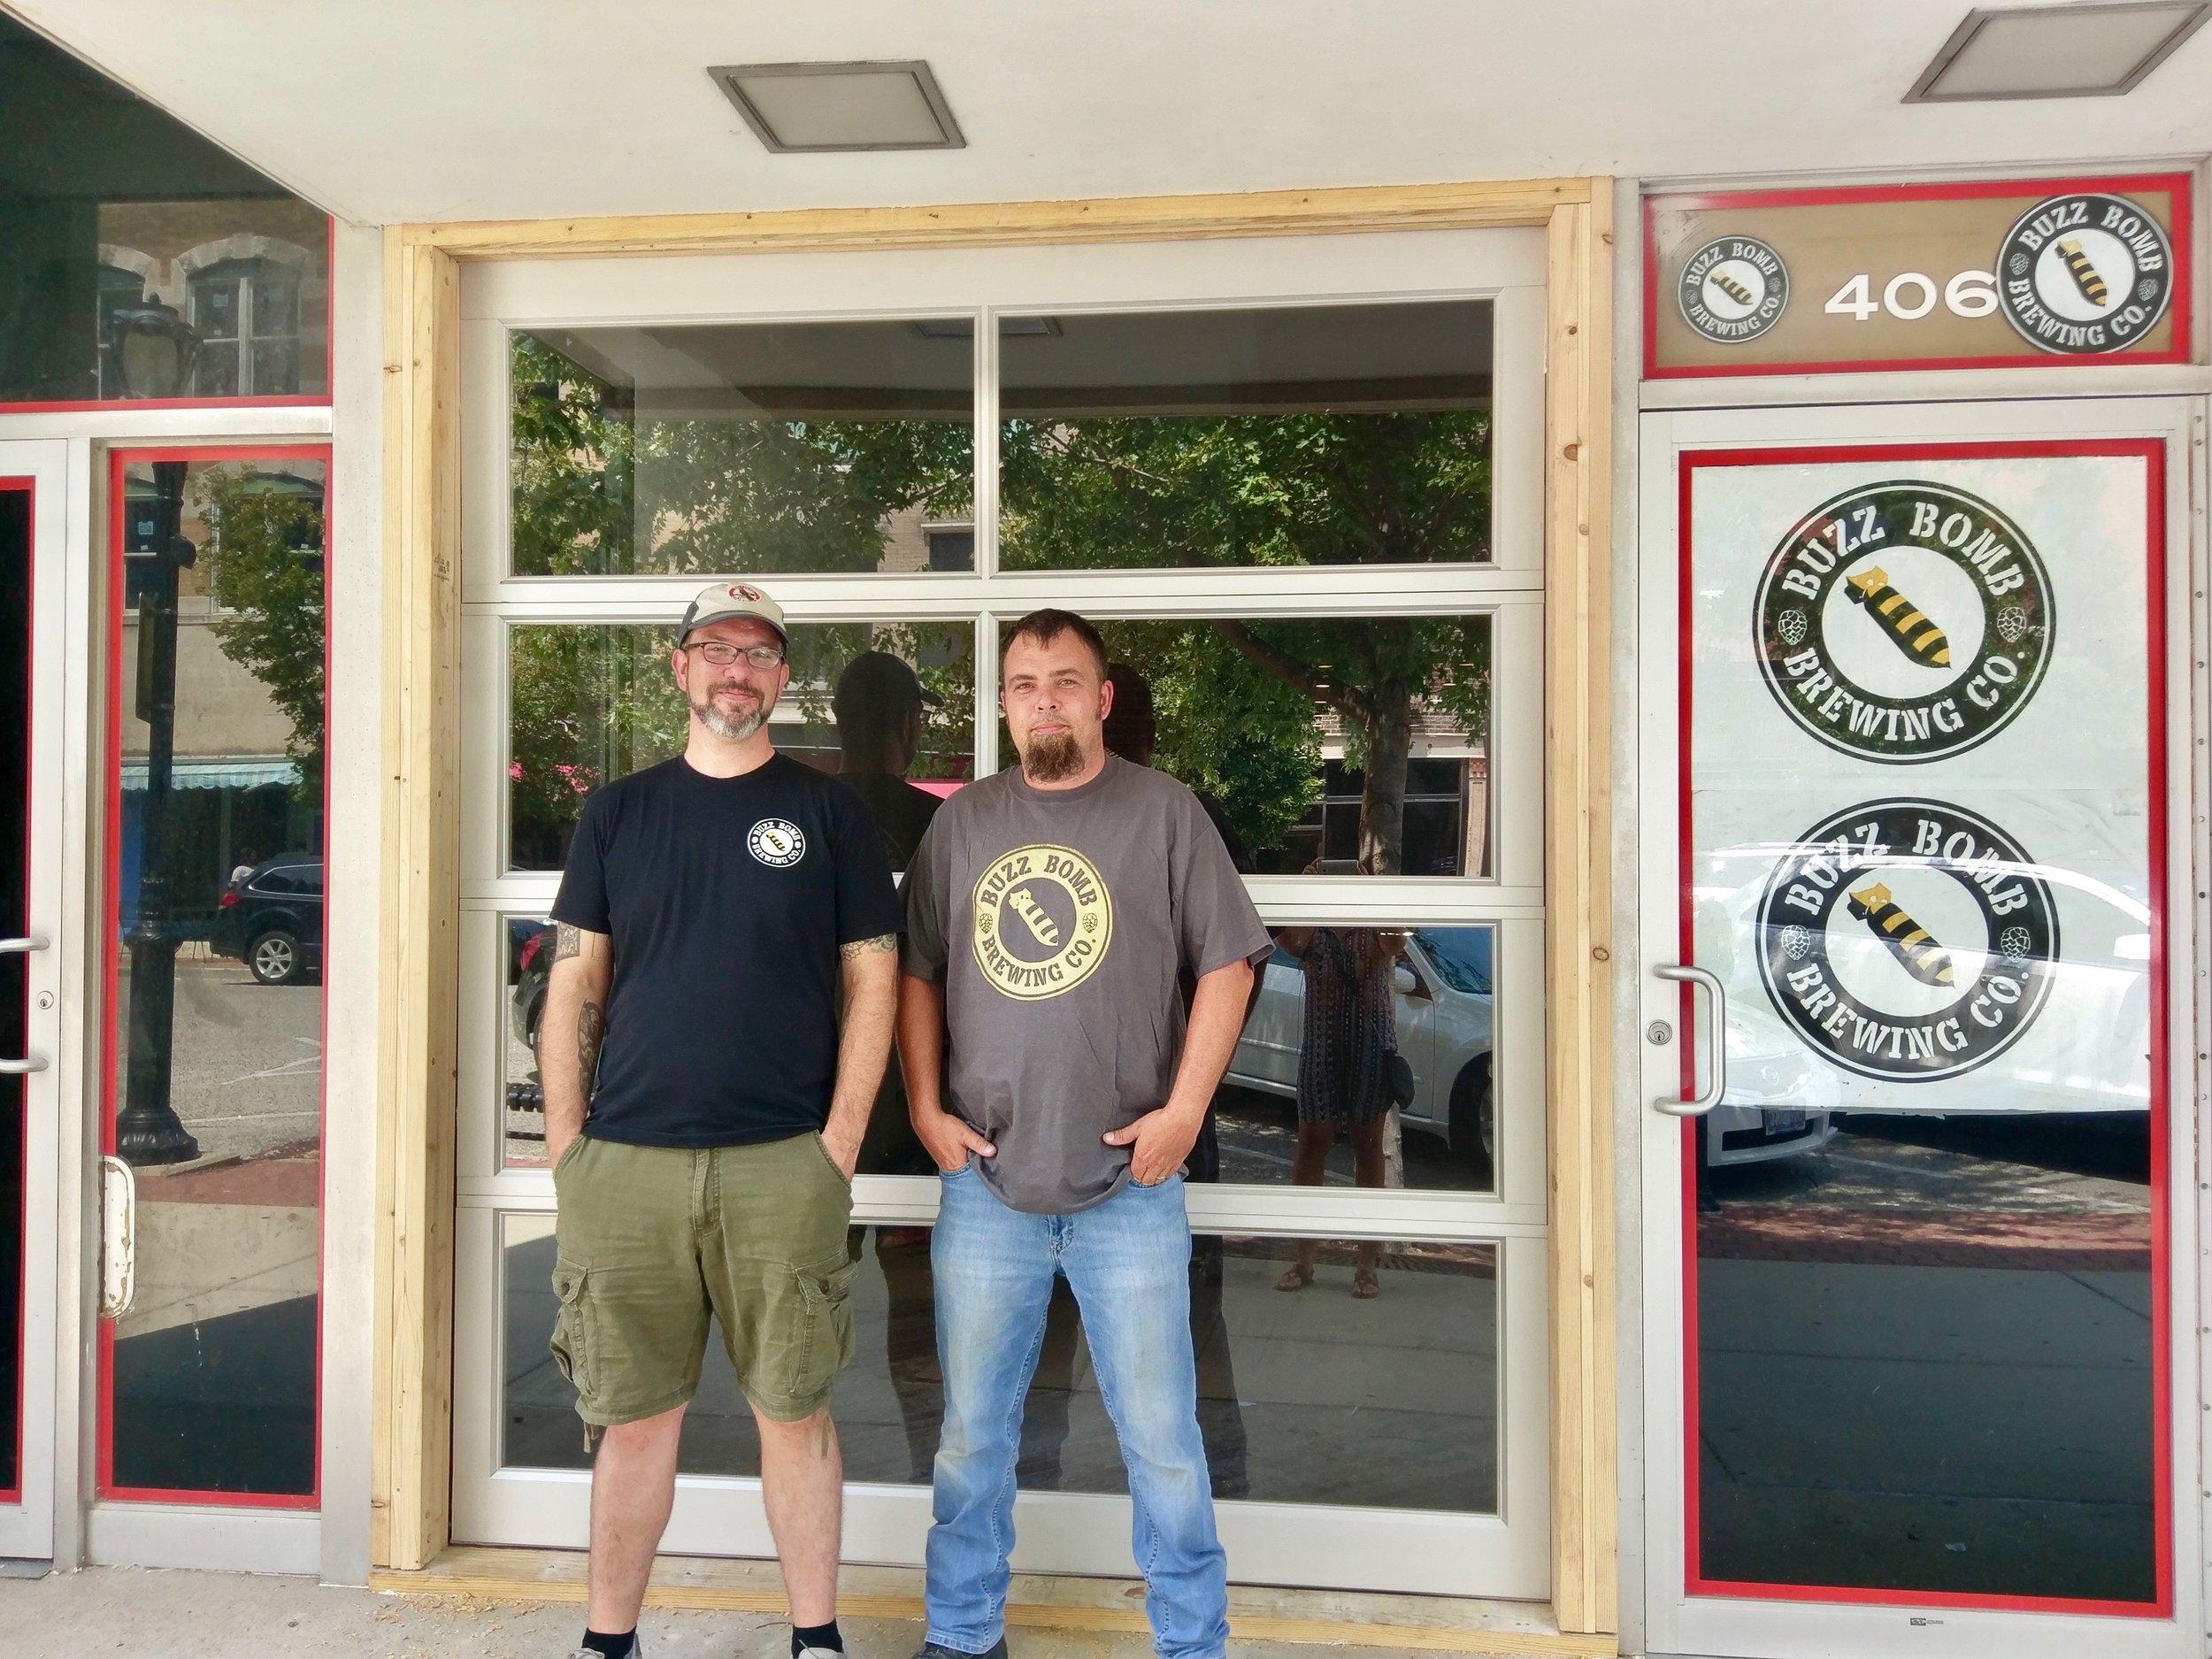 Josh Flanders & Bill Larson, Buzz Bomb Brewing co.